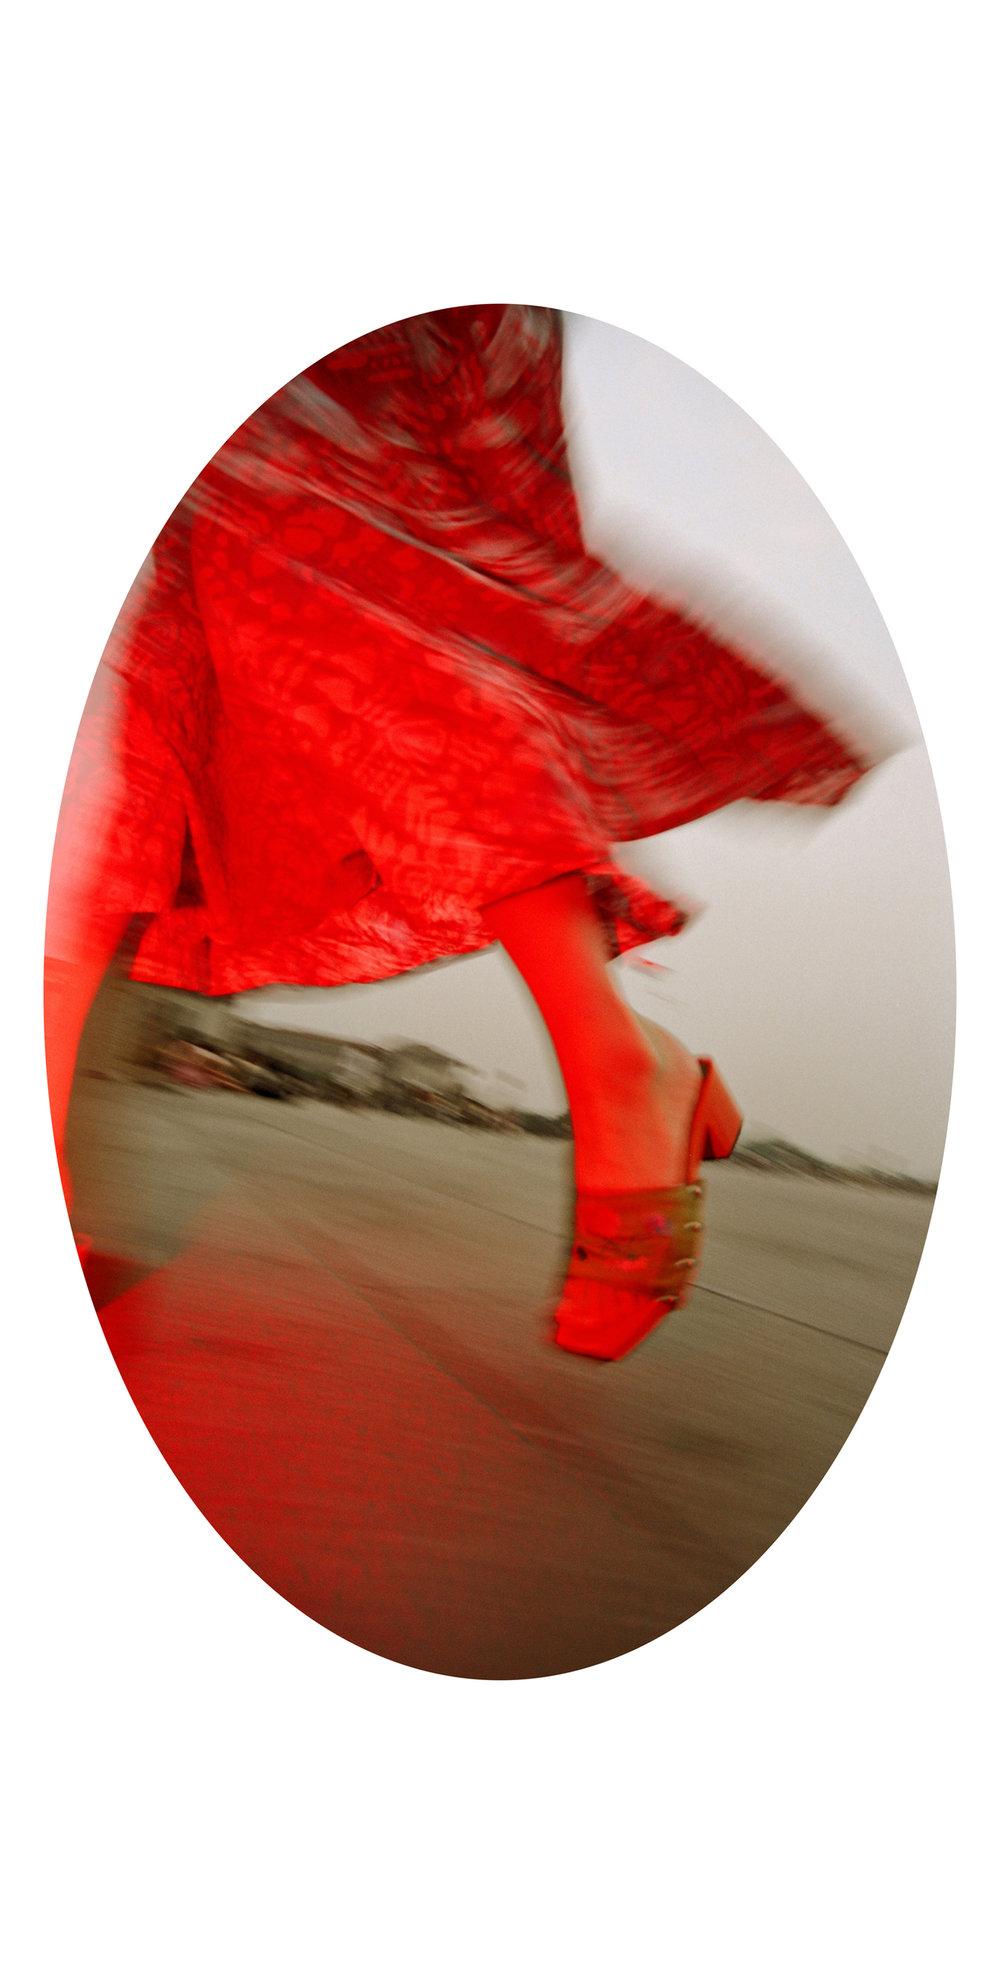 6-the unbearable lightness of Takako dress-Moyi - Dog eye - Chongzi & her red skirt - 07-moyi-photography-of-china.jpg